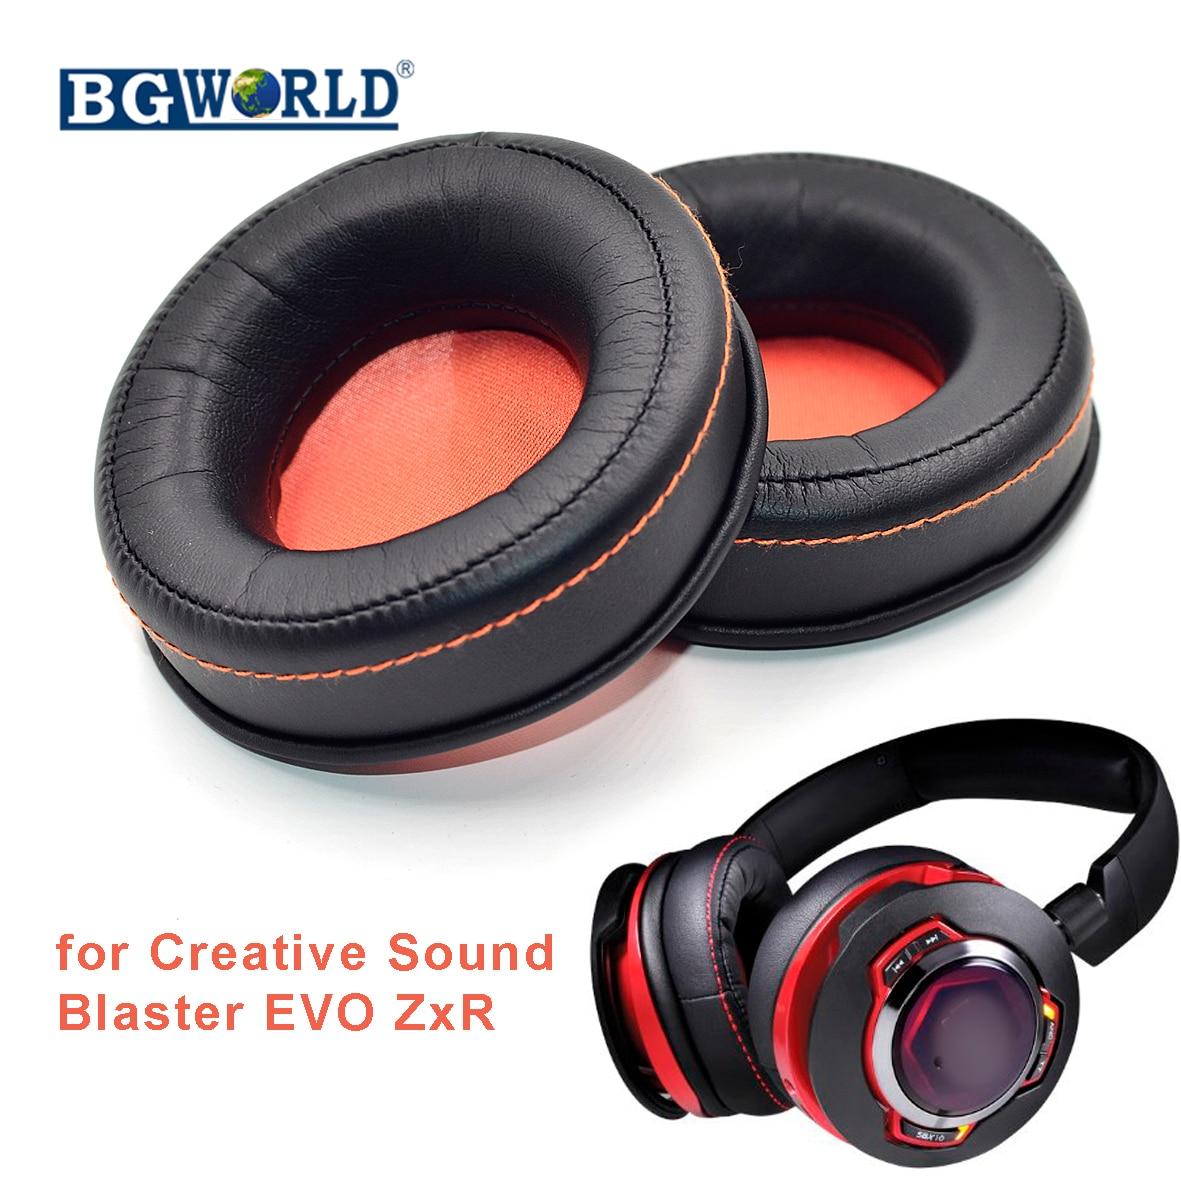 BGWORLD Replacement Ear pads foam cushion for Creative Sound Blaster EVO ZxR Entertainment Headphone